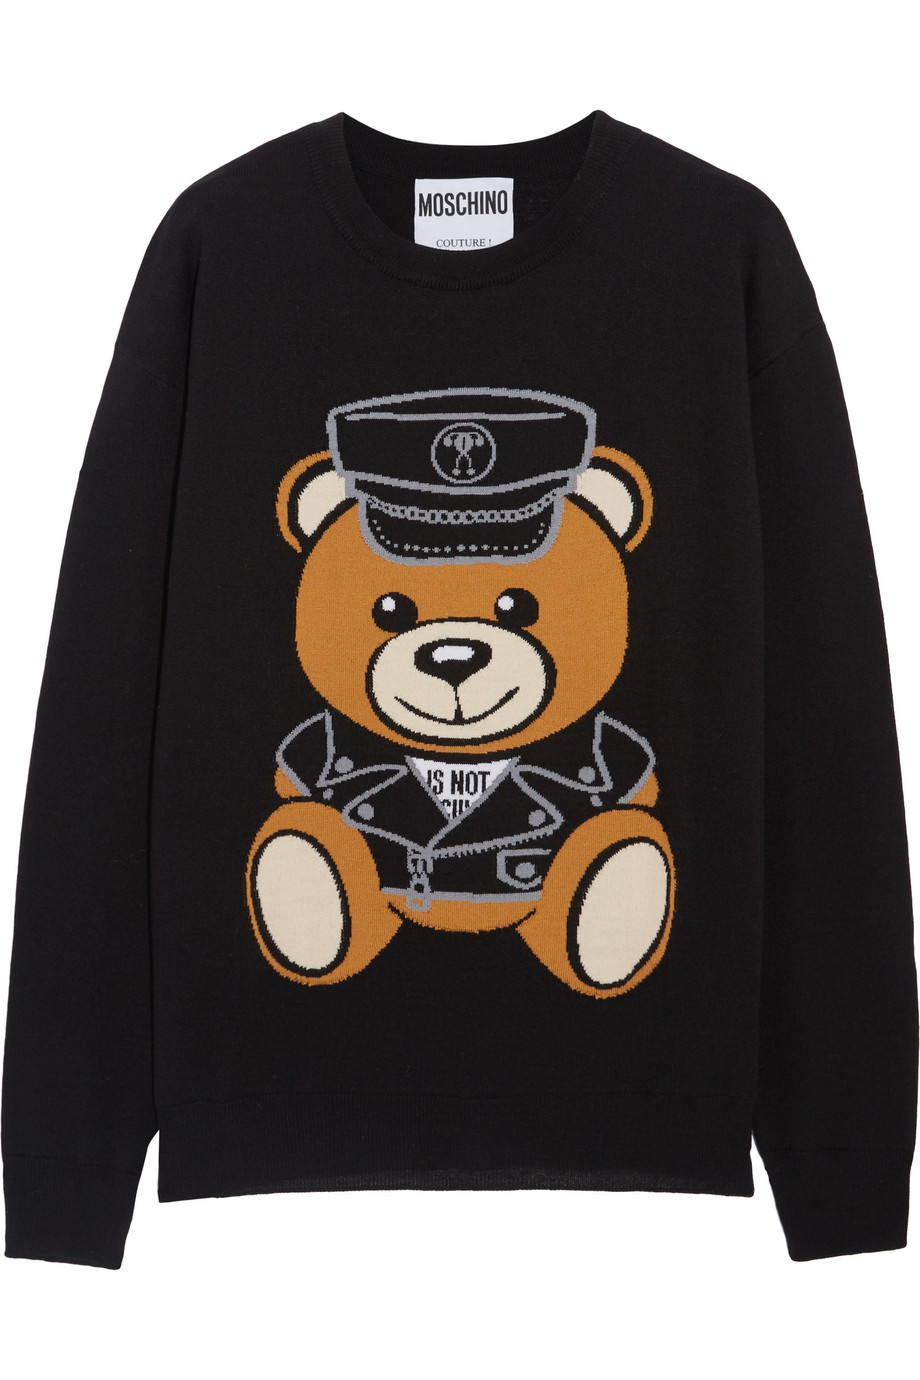 Moschino Intarsia Wool Sweater, Black, Women's, Size: XXS